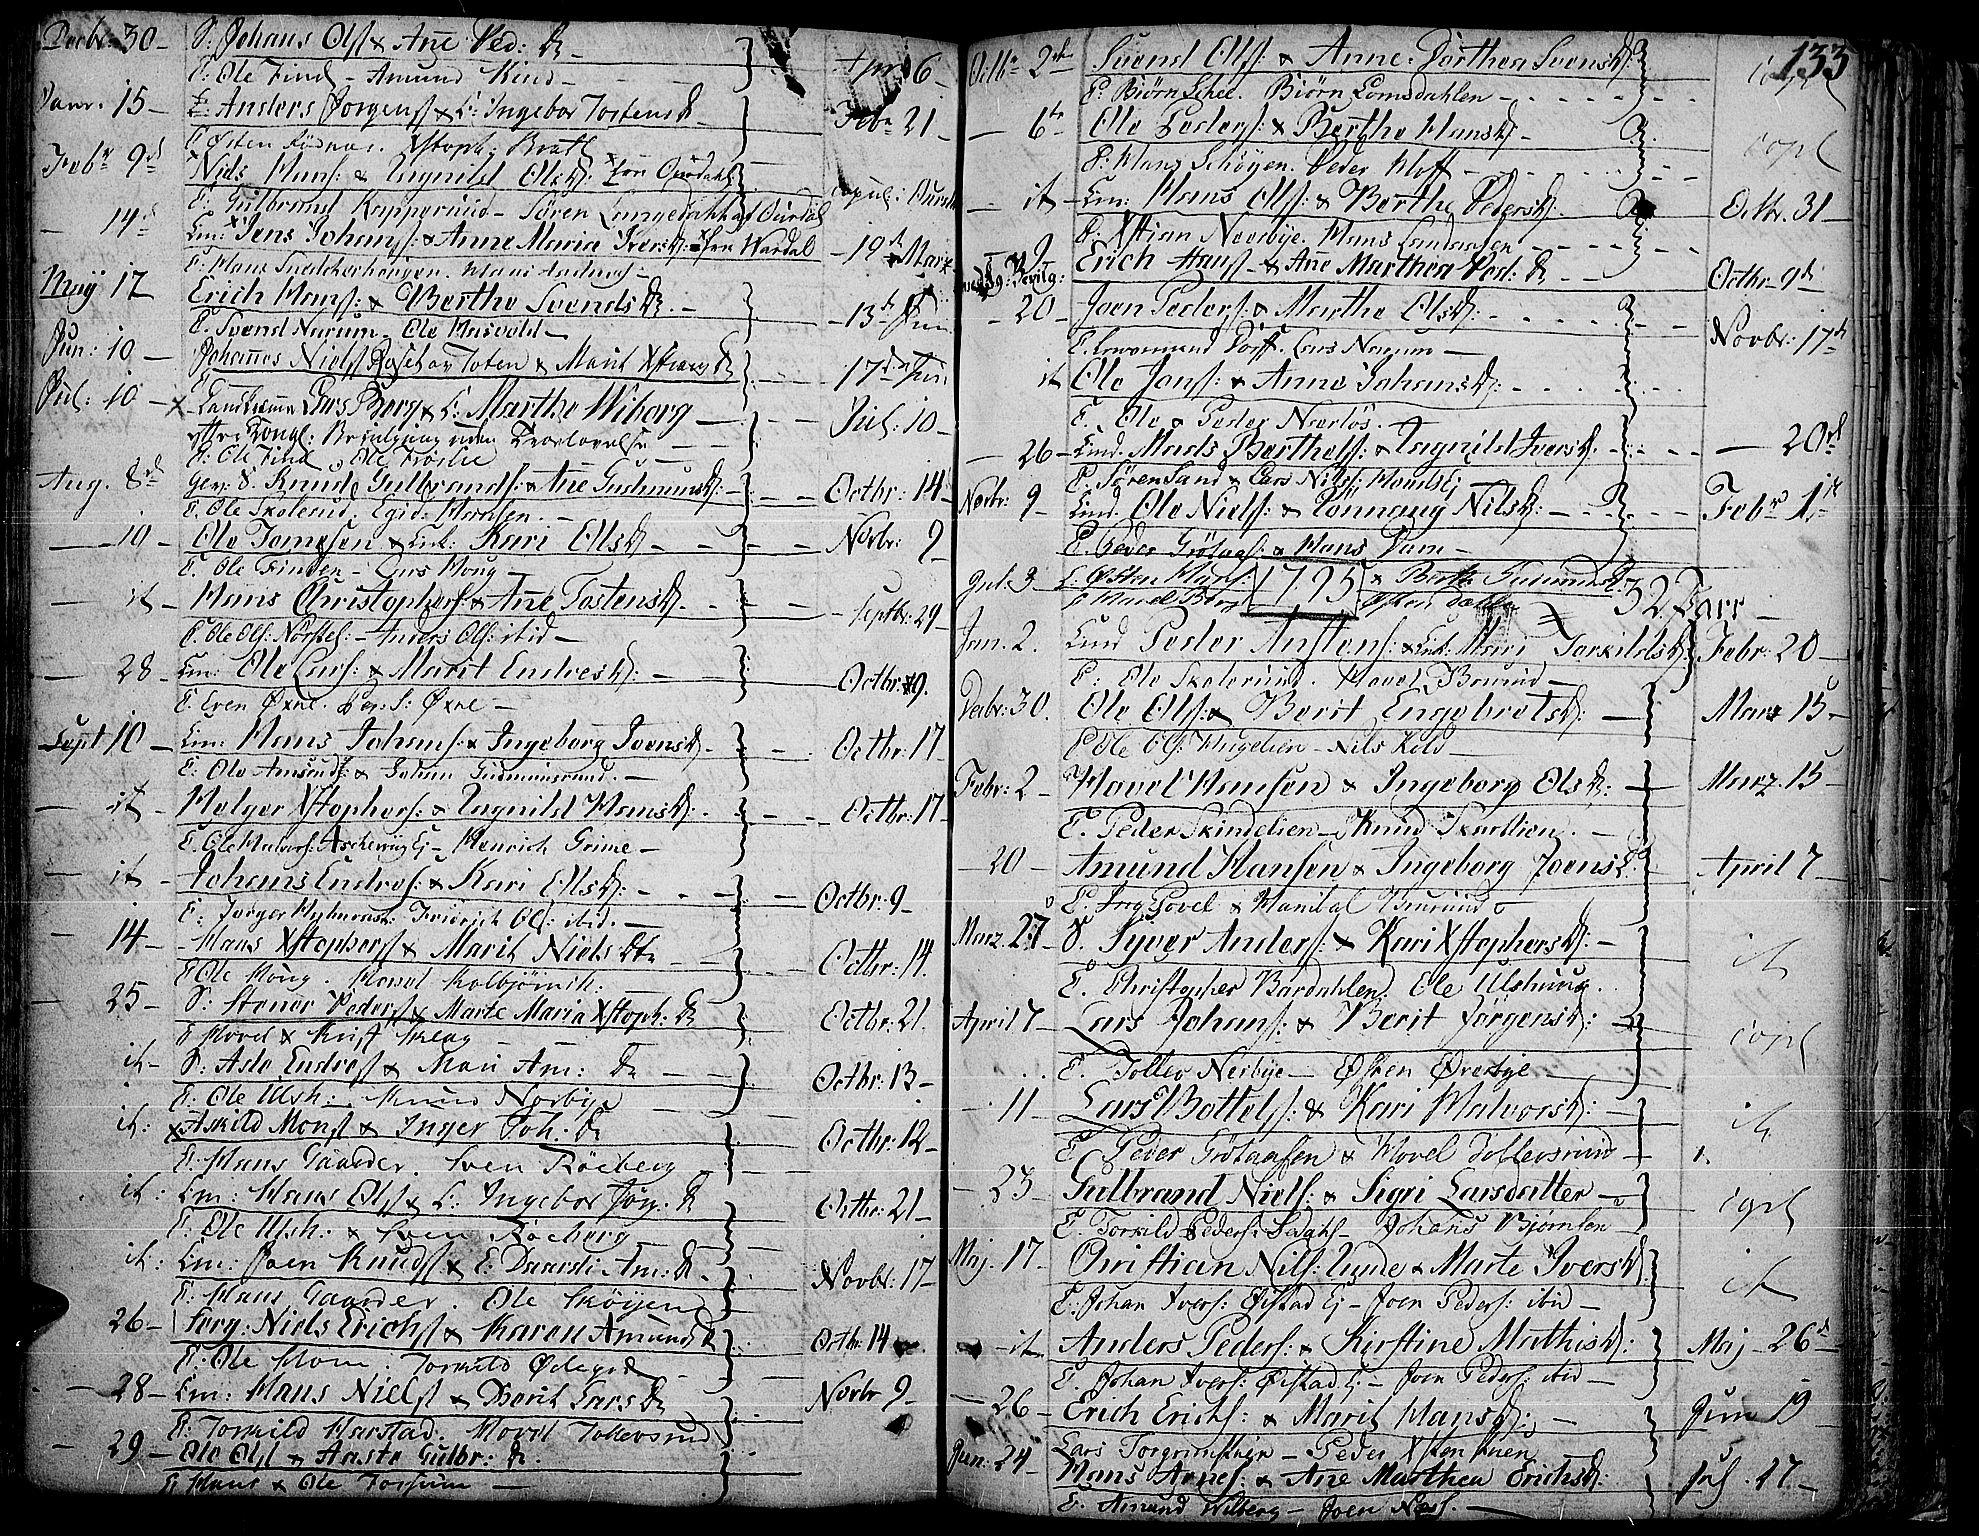 SAH, Land prestekontor, Ministerialbok nr. 6, 1784-1813, s. 133